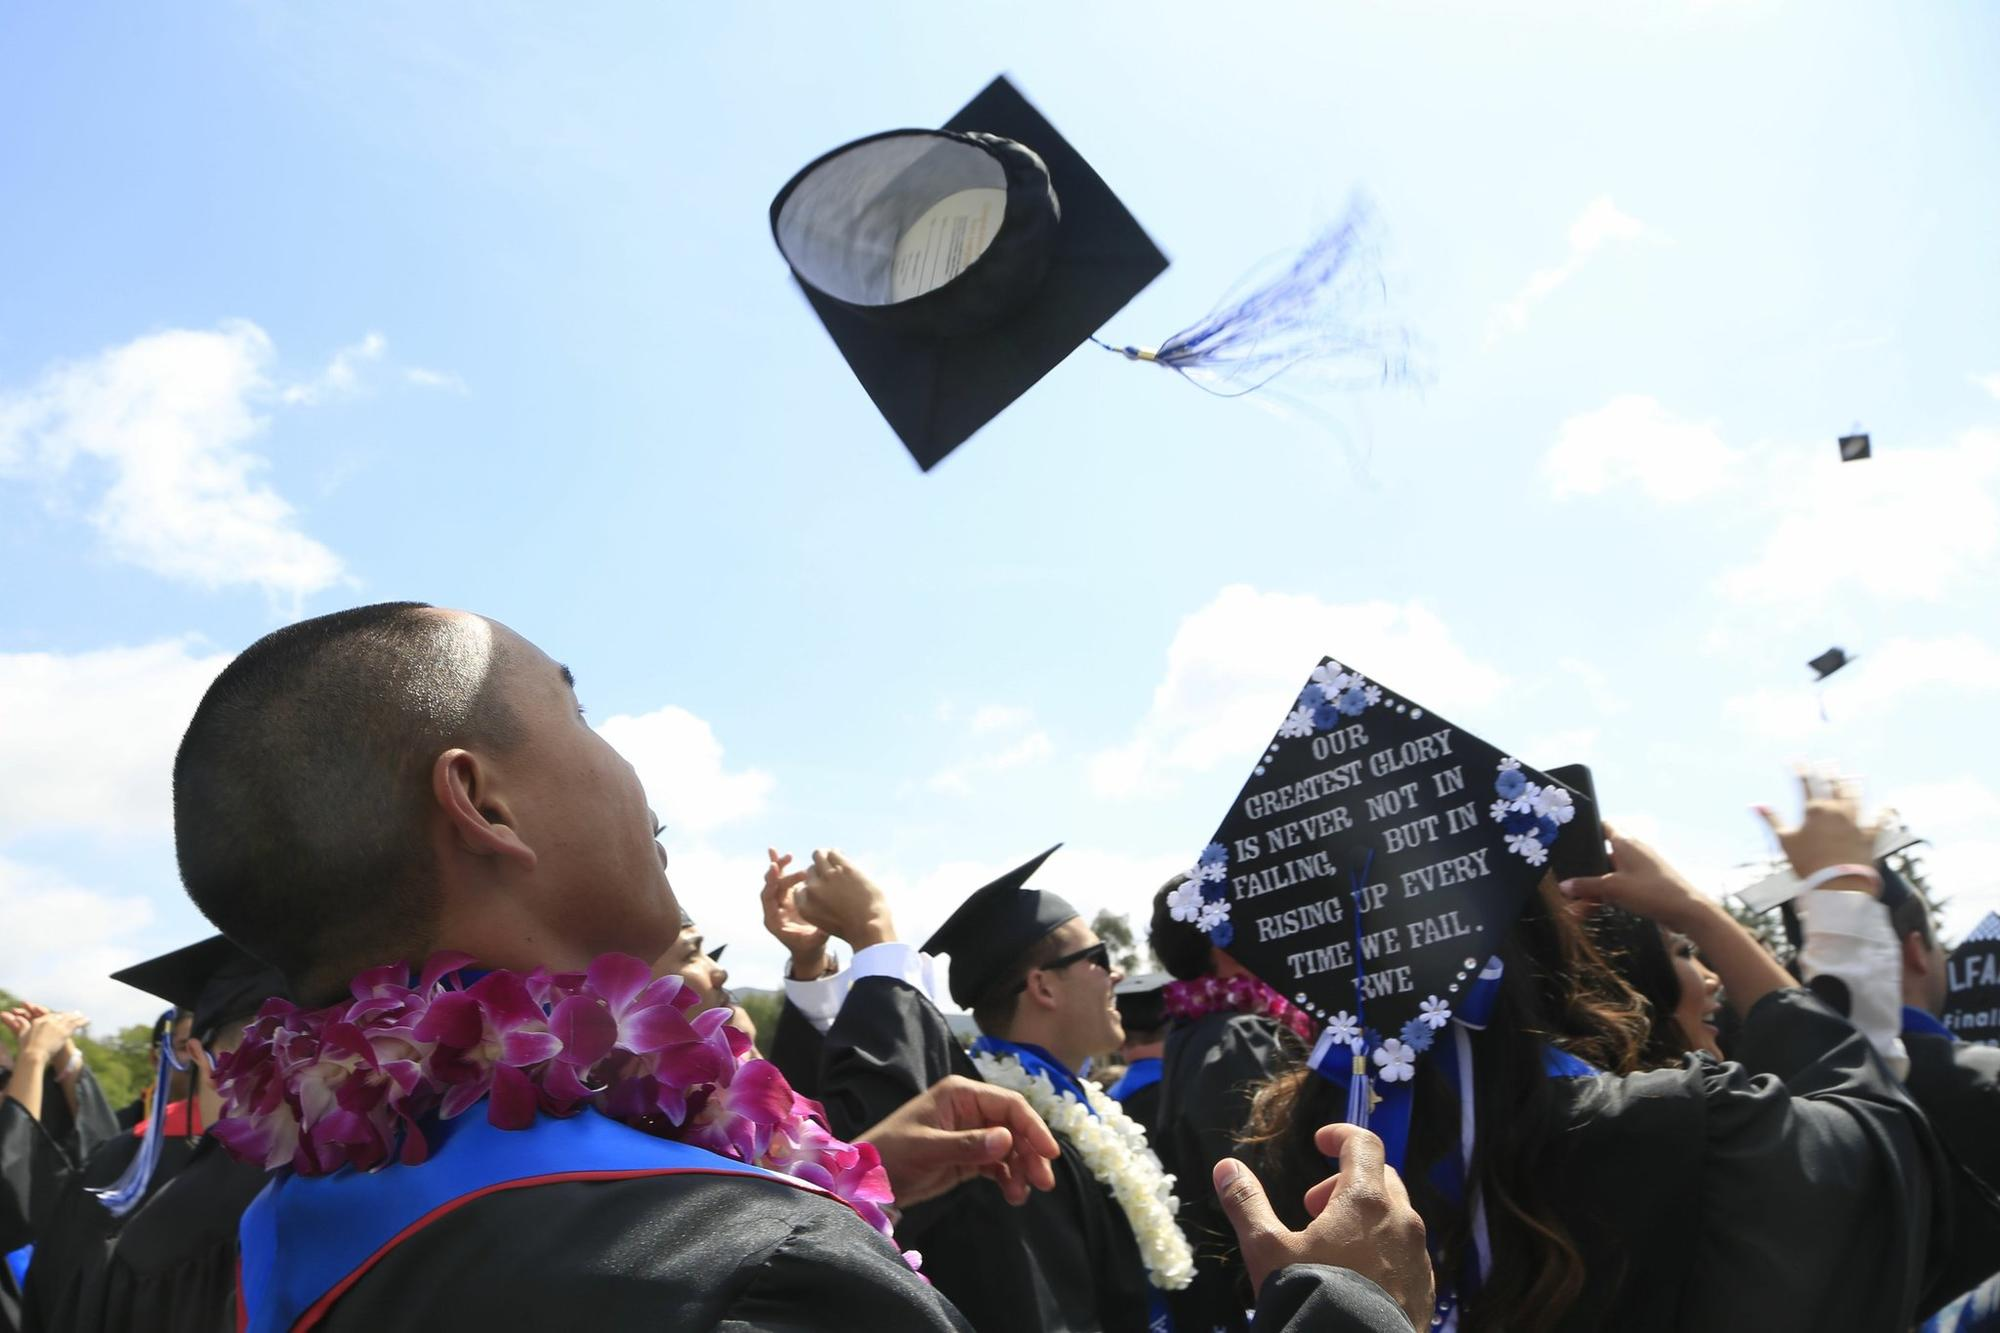 Cal State San Marcos Graduation 2015